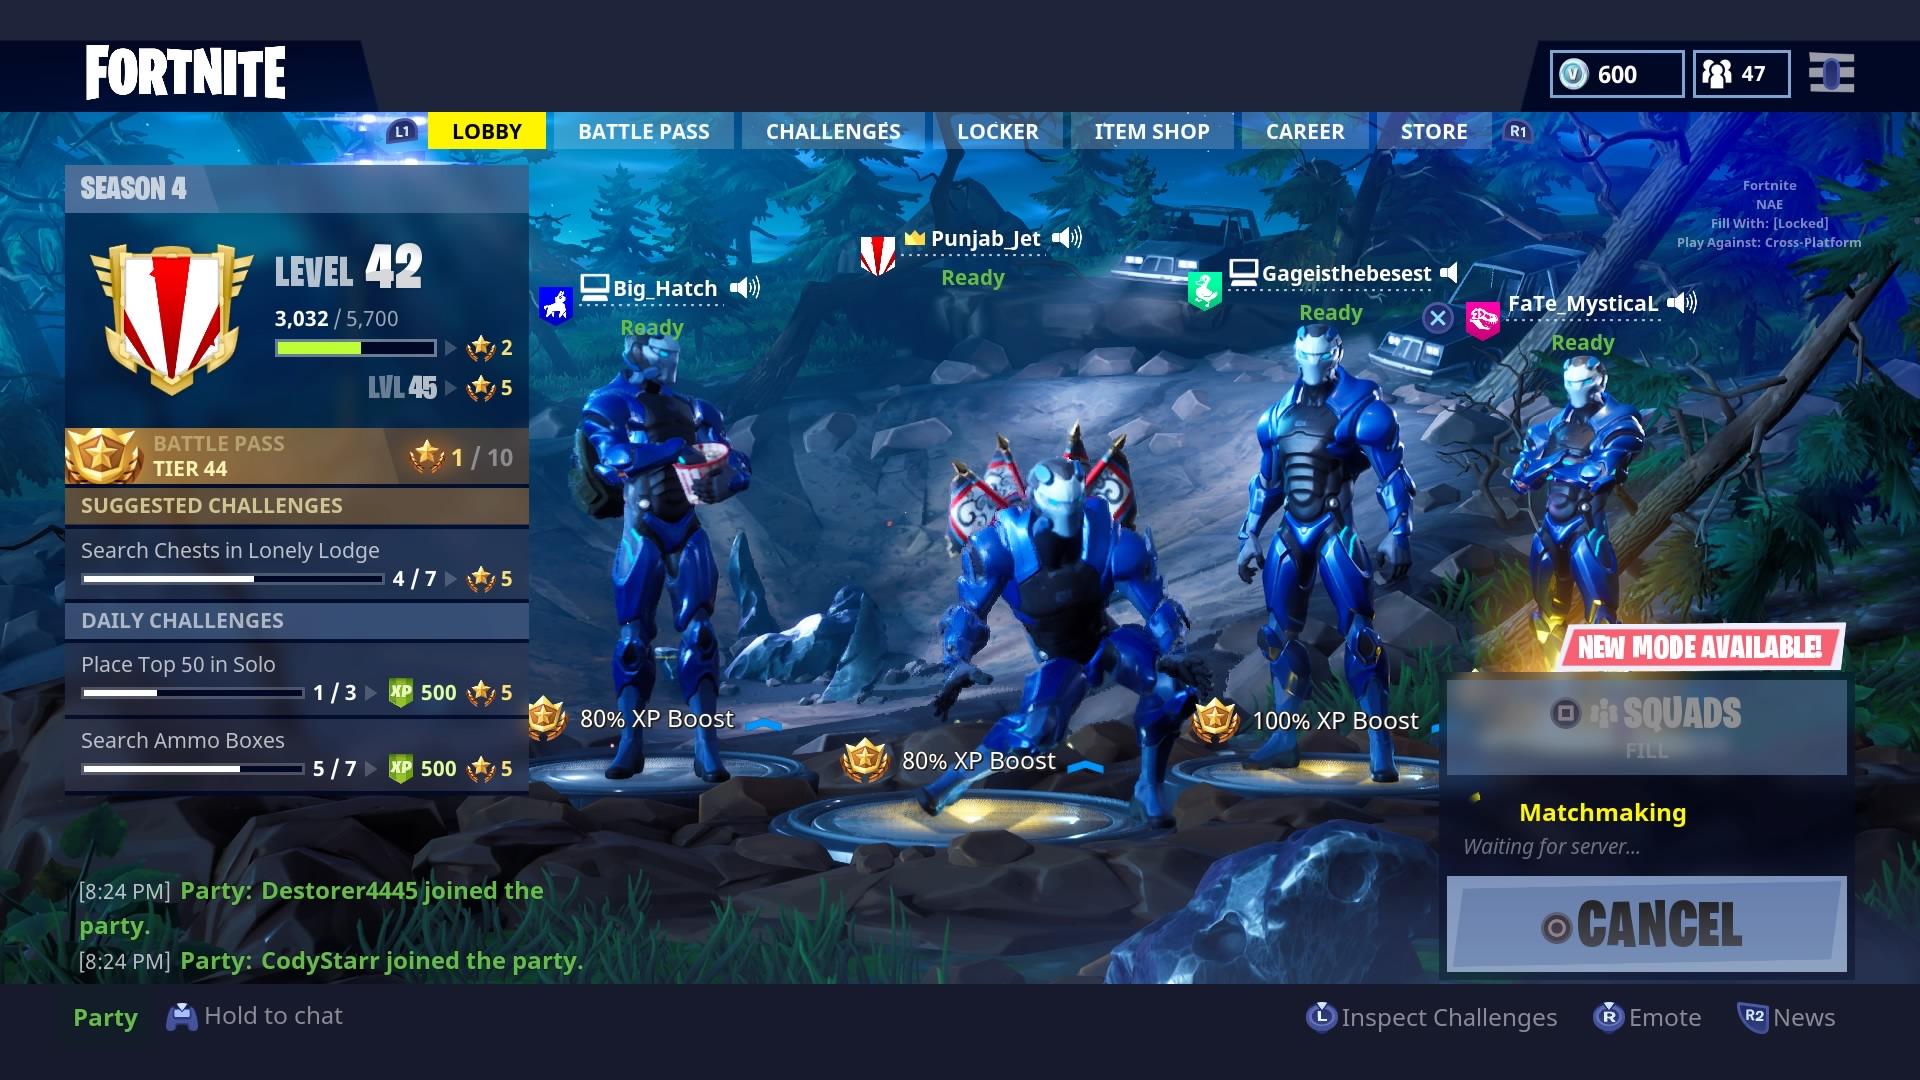 fortnite matching squad wallpaper 63756